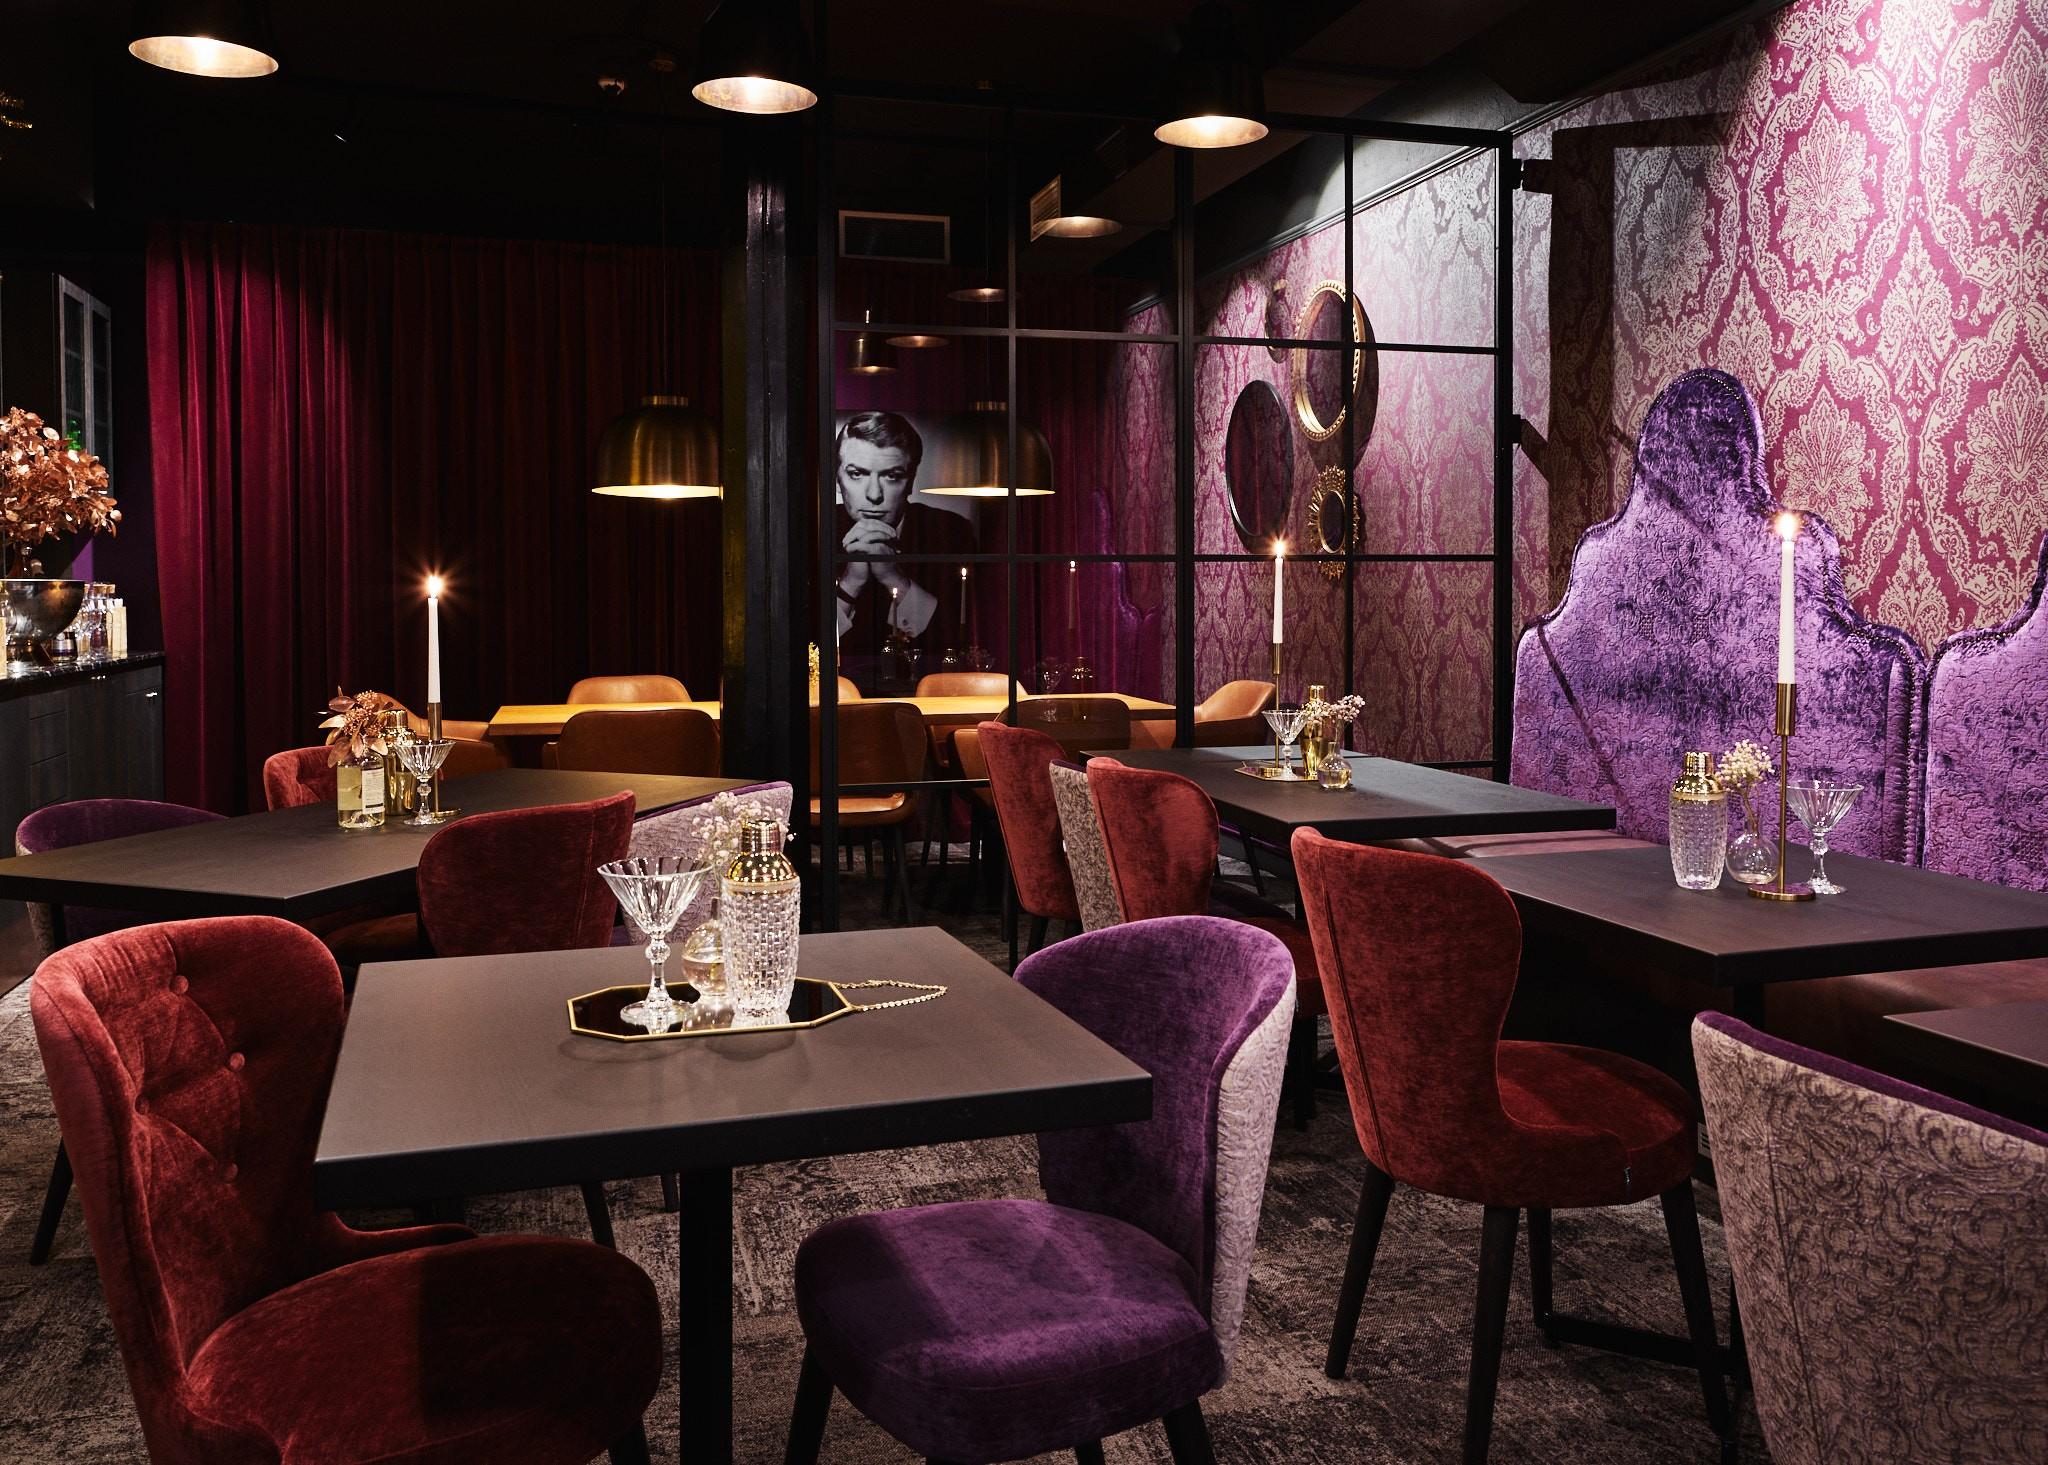 Restaurang SysterOBror | LinkedIn